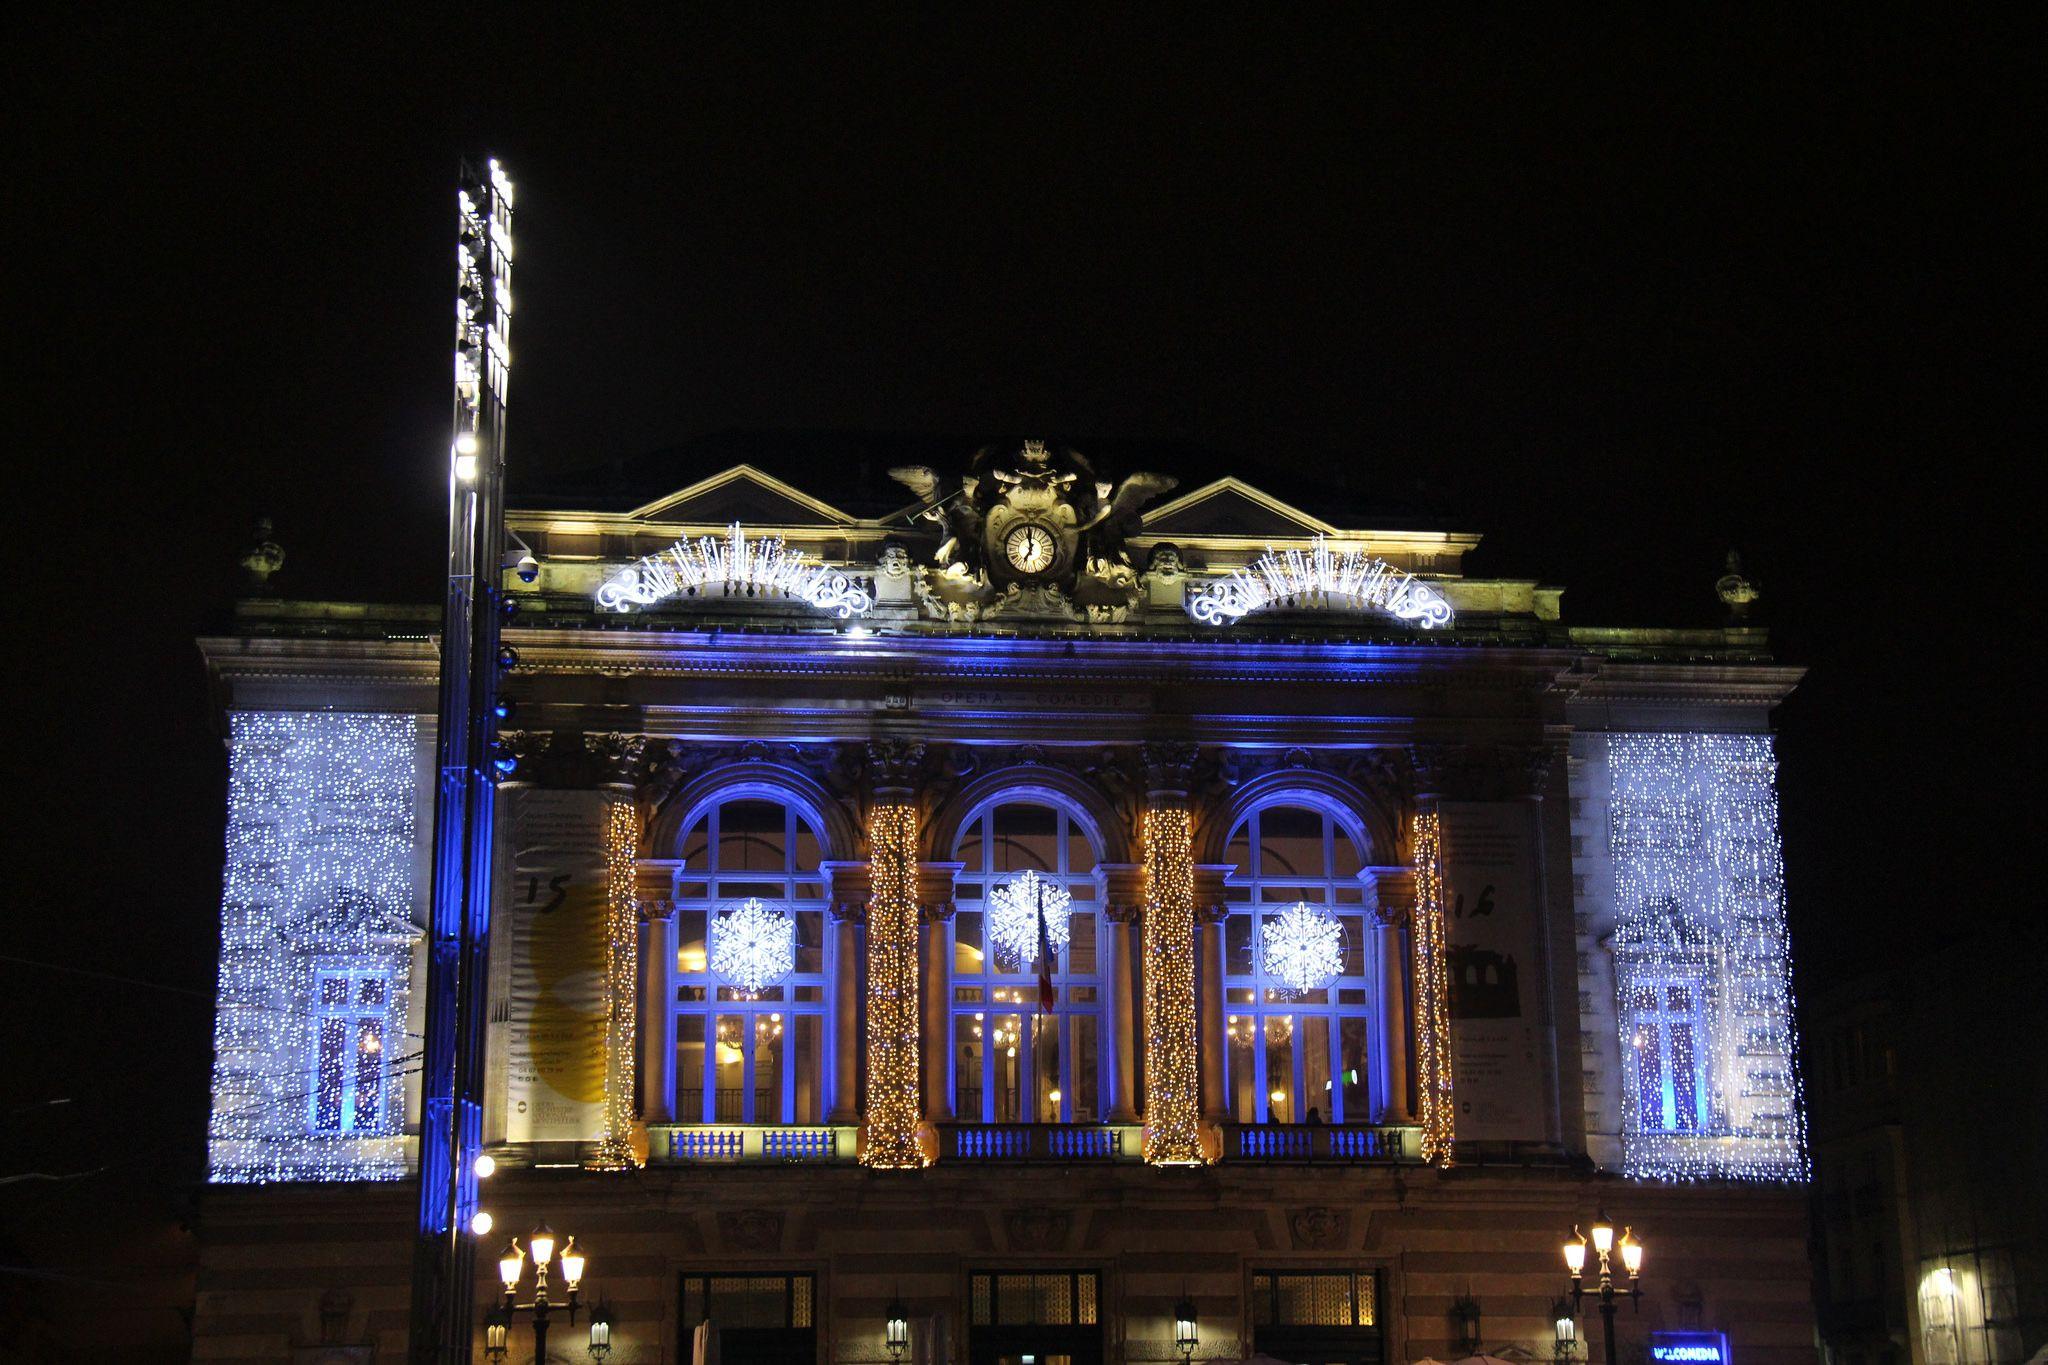 https://flic.kr/p/BHdhC1 | Opéra Comédie Montpellier